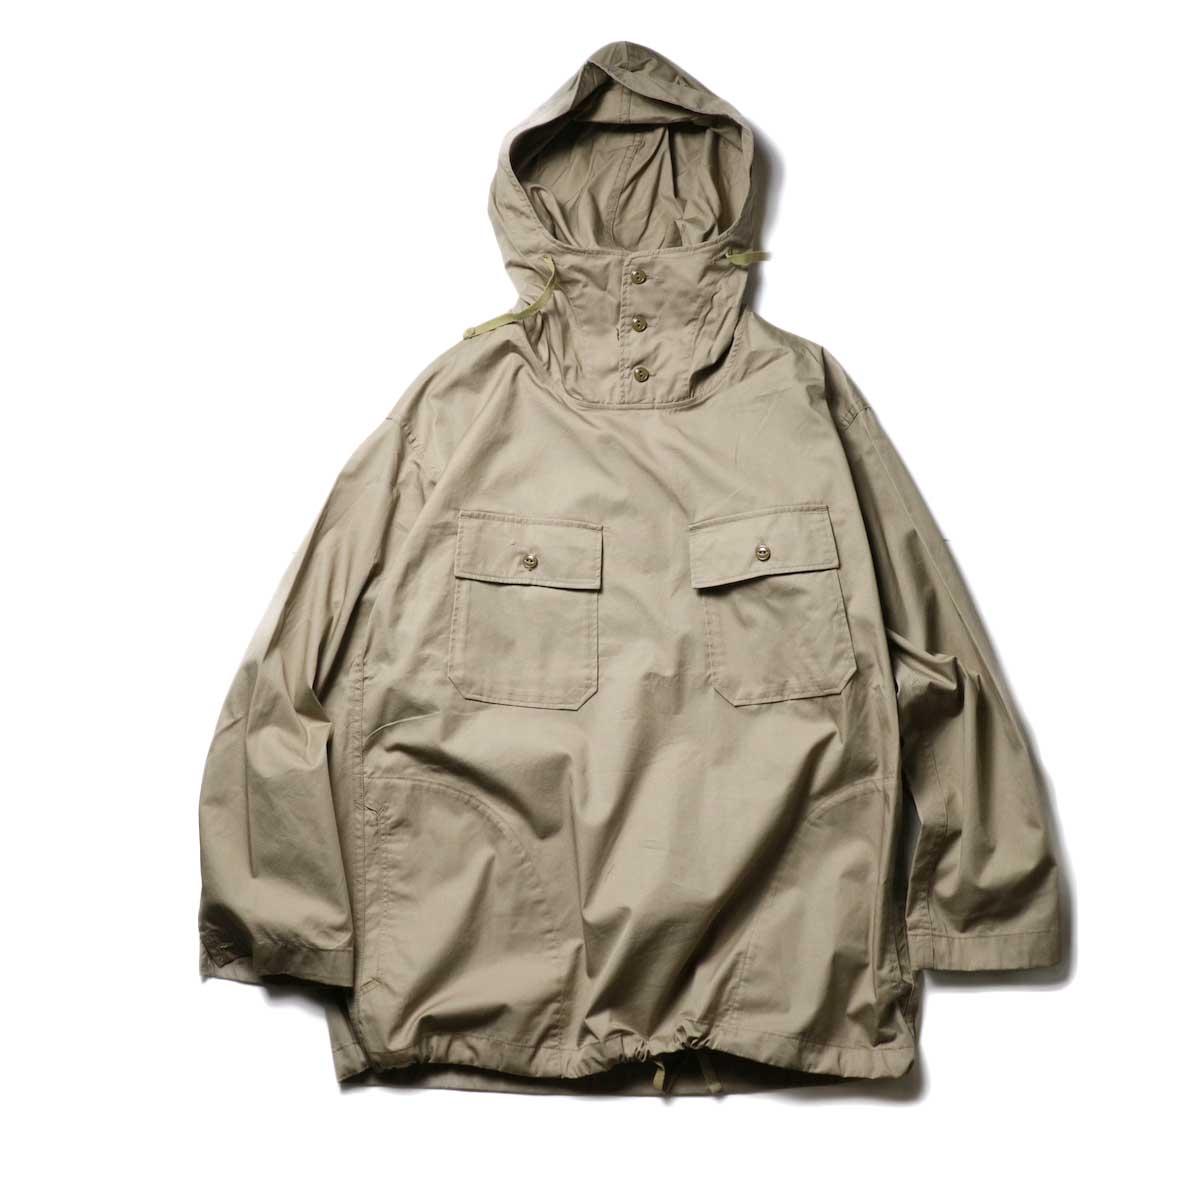 Engineered Garments / Cagoule Shirt -High Count Twill (Khaki)